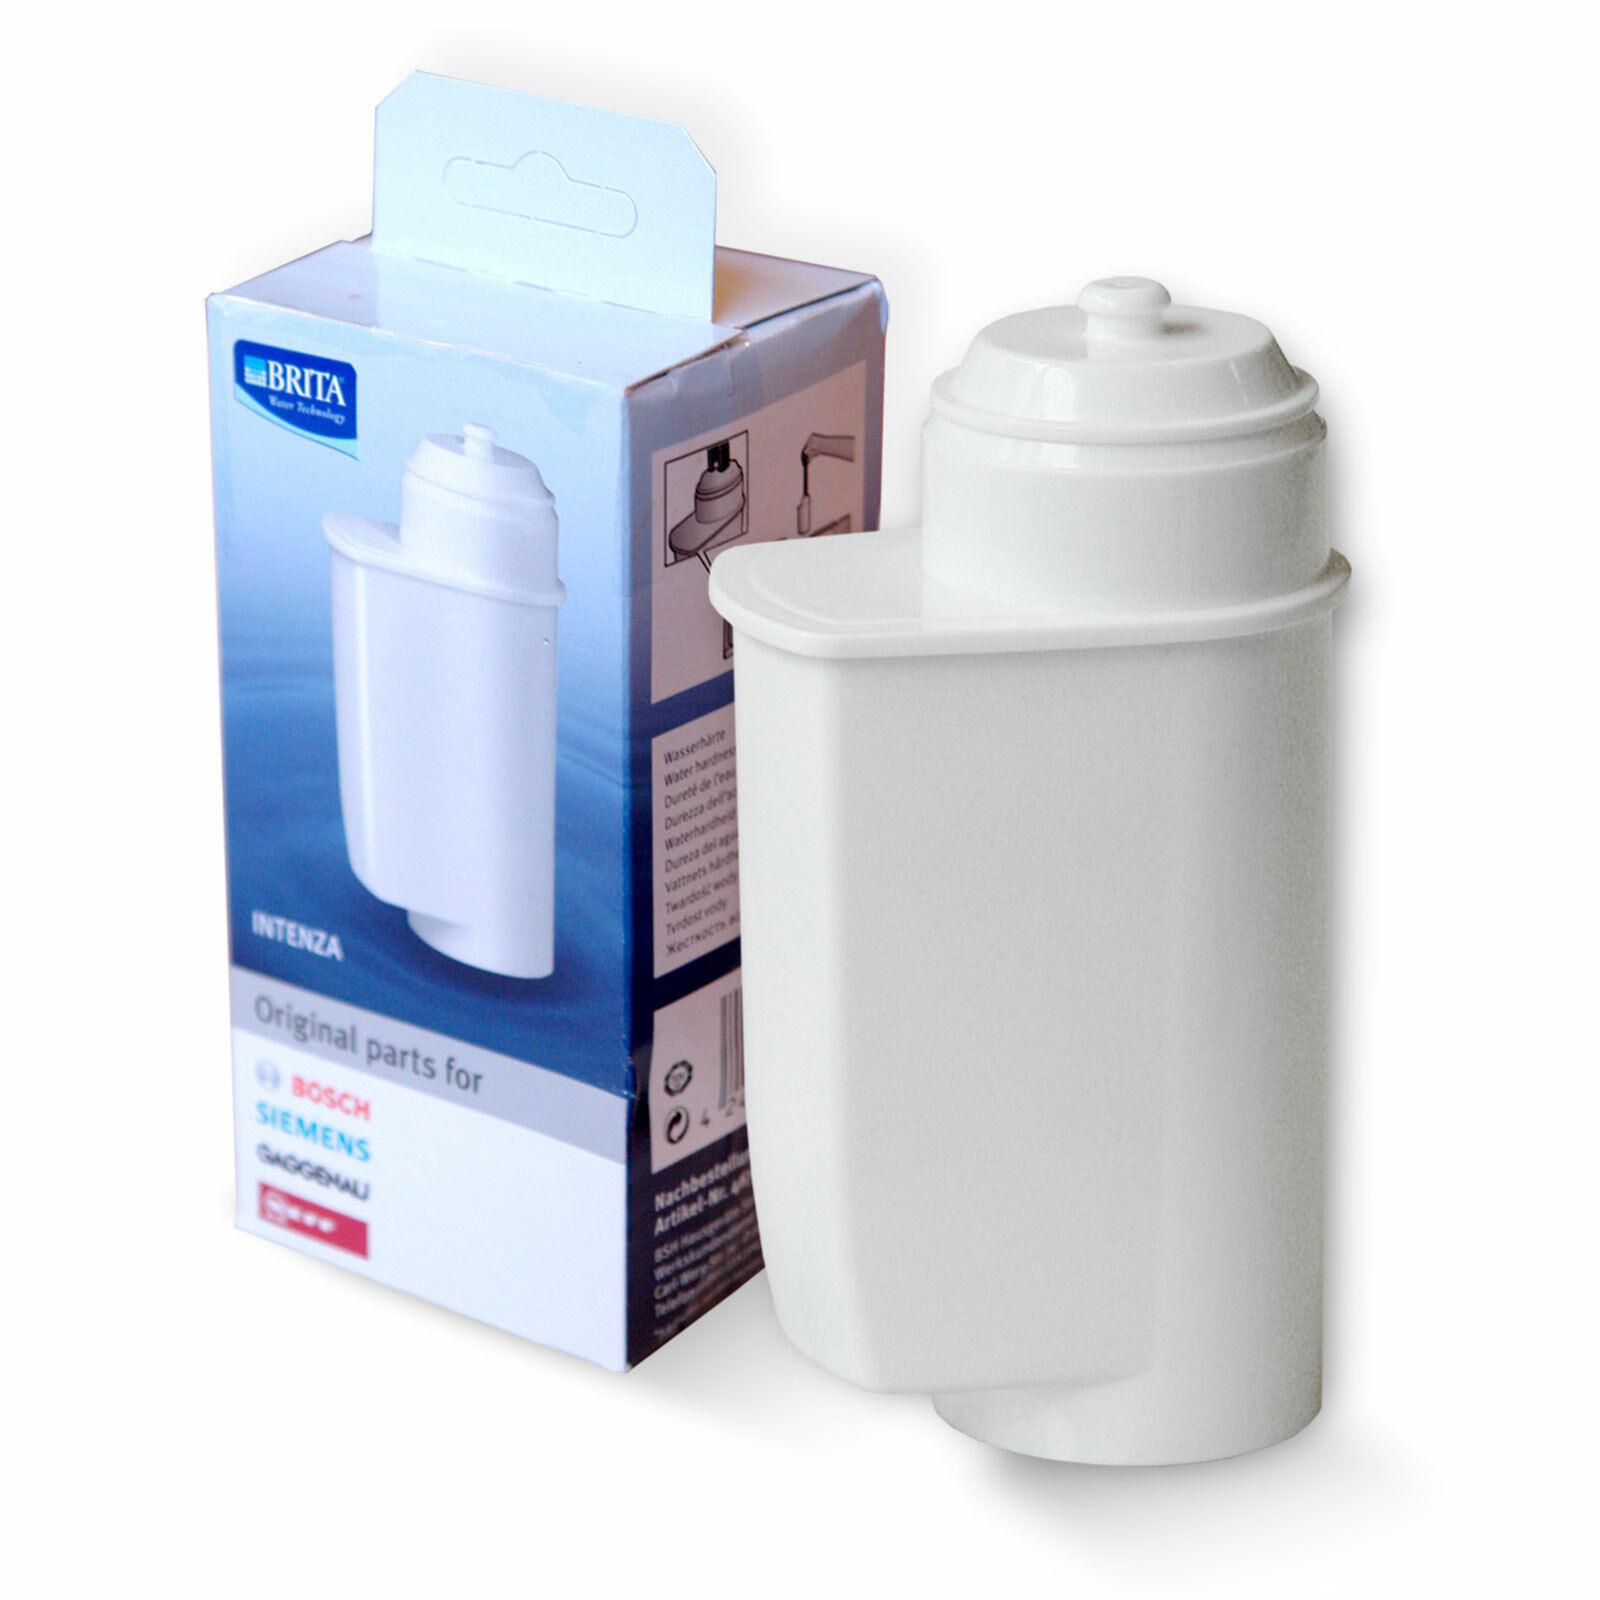 20x Brita Intenza filtro de agua compatibles para Bosch Vero tca7 tcc7 tcc78 serie